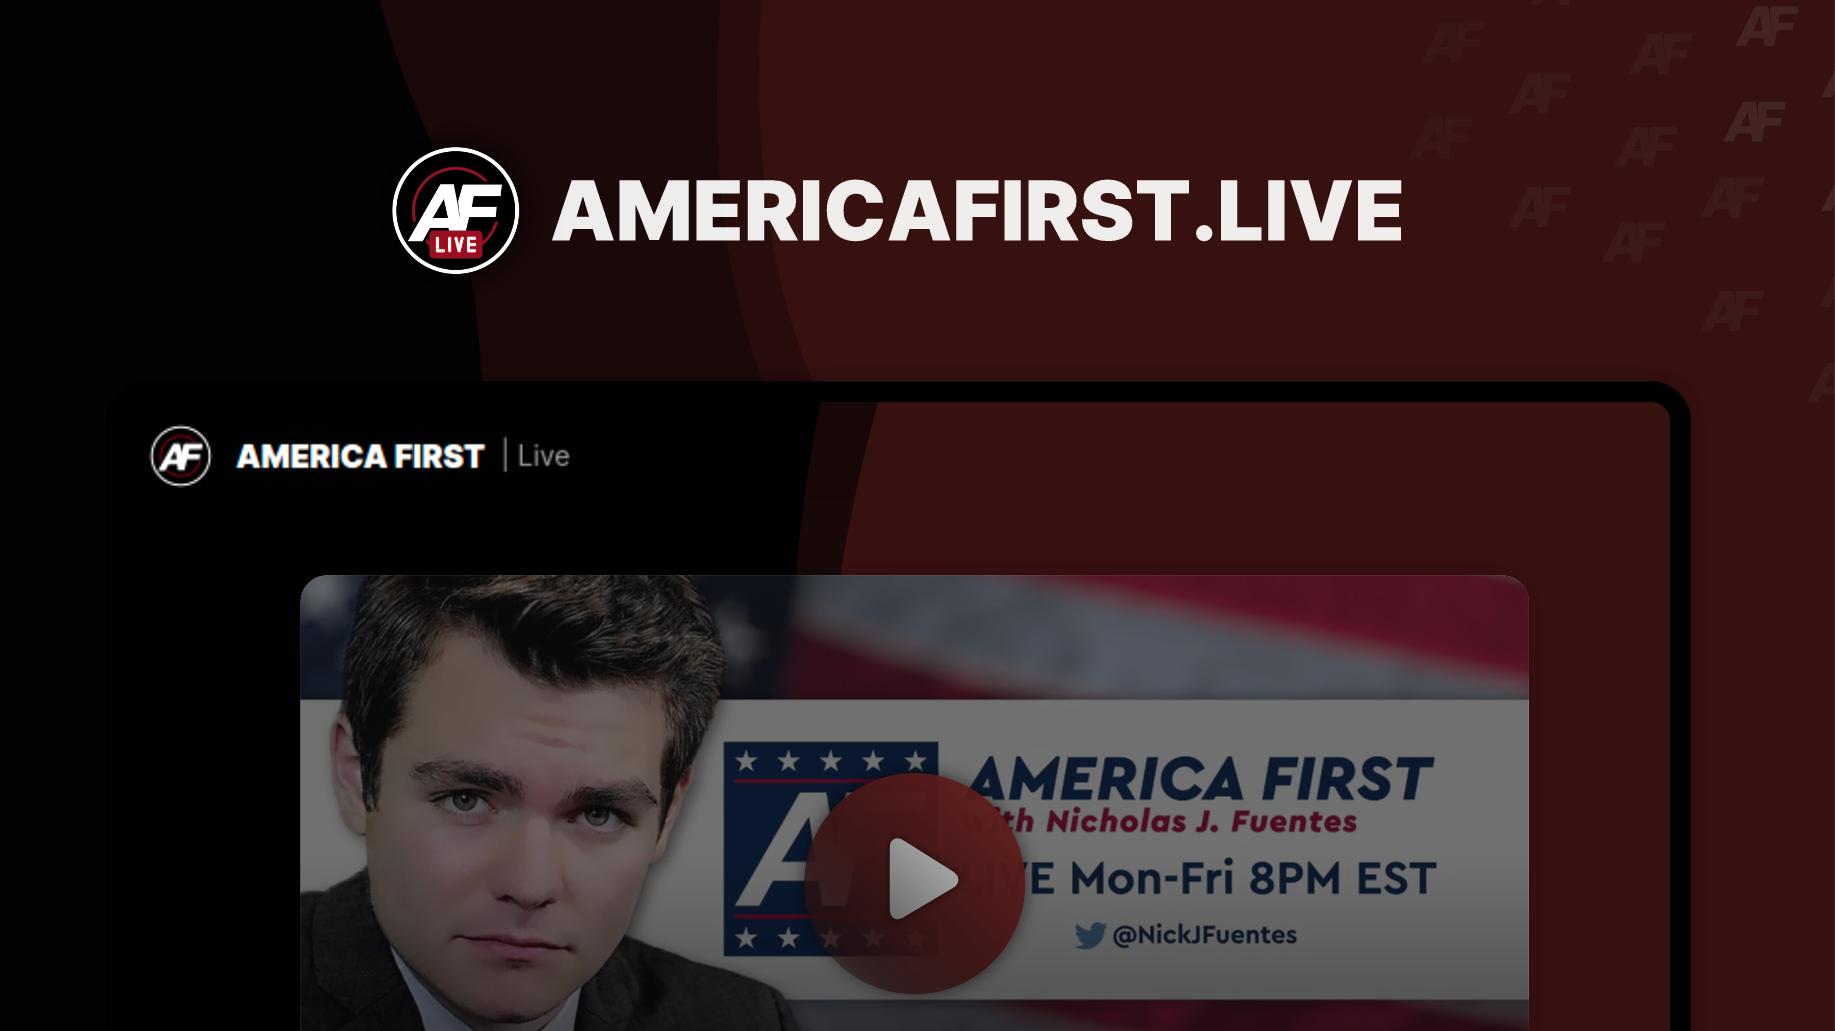 americafirst.live